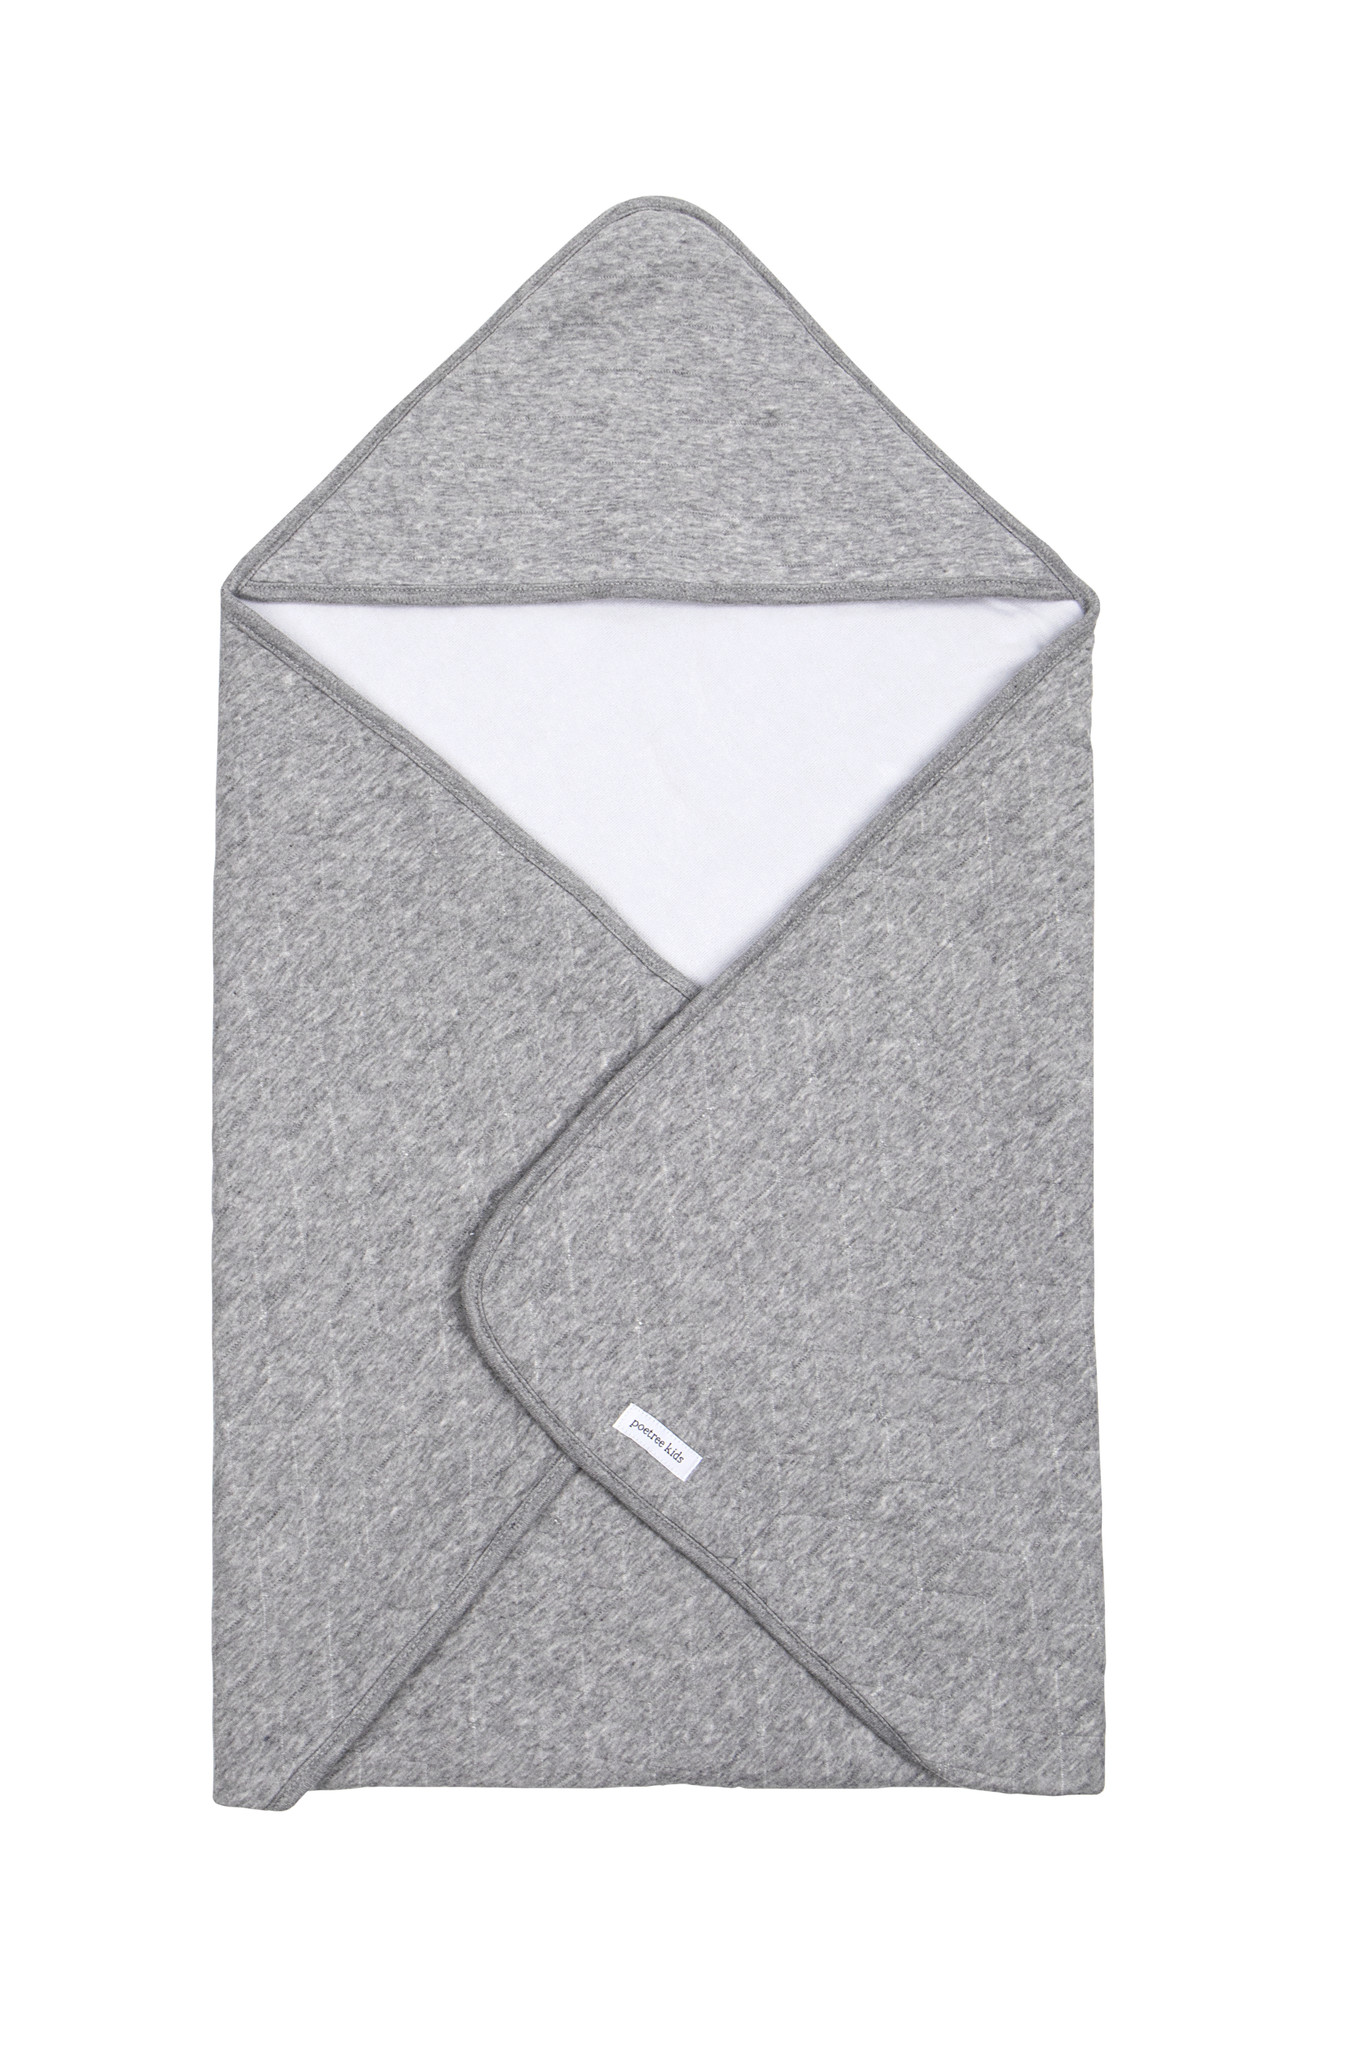 Wrapping blanket Star Grey Melange-1